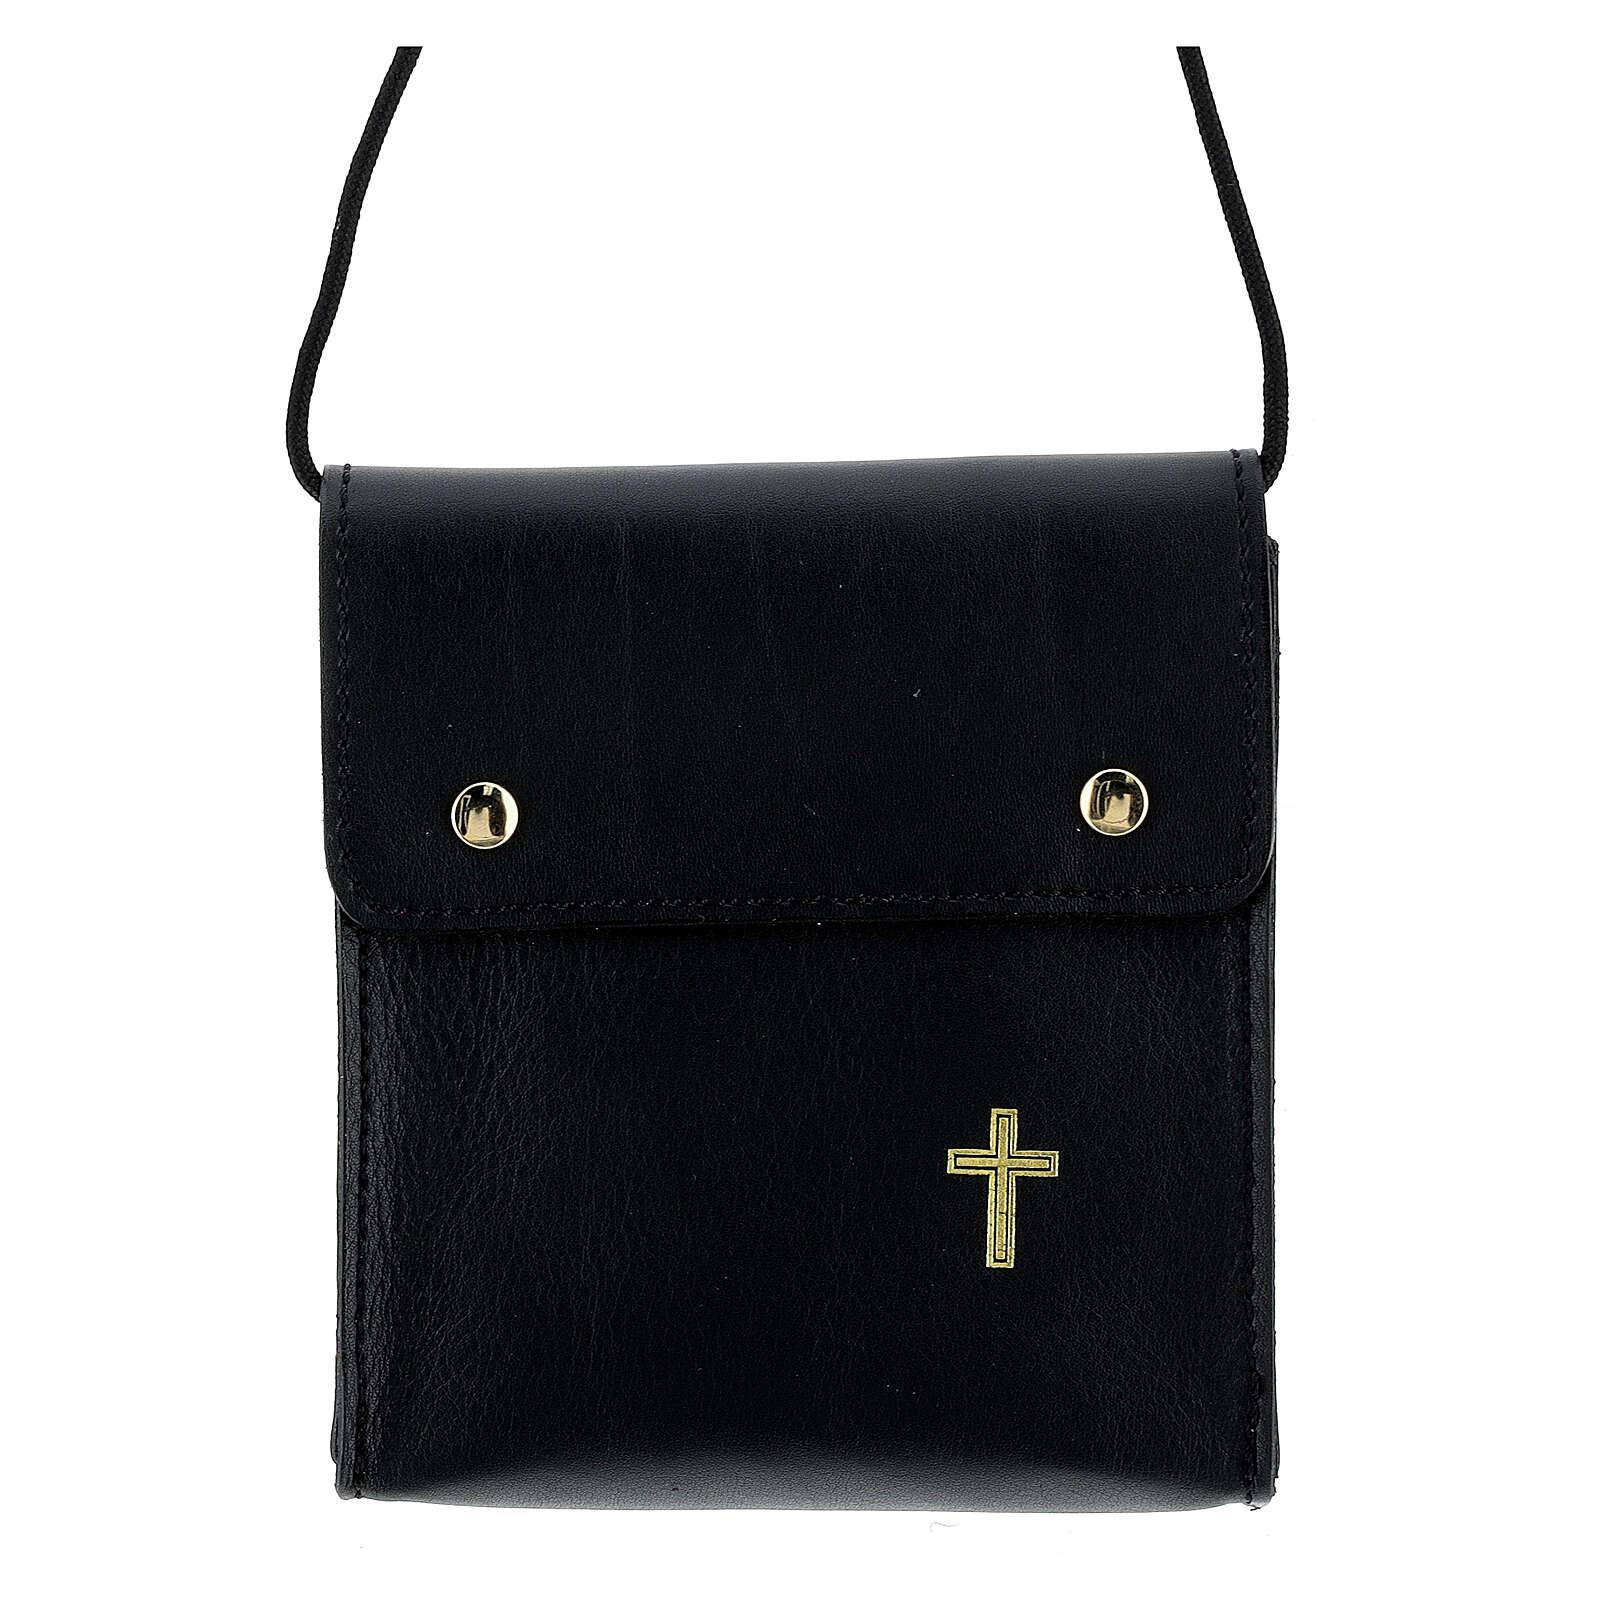 Rectangular paten burse 5x4 1/2 in real black leather 4